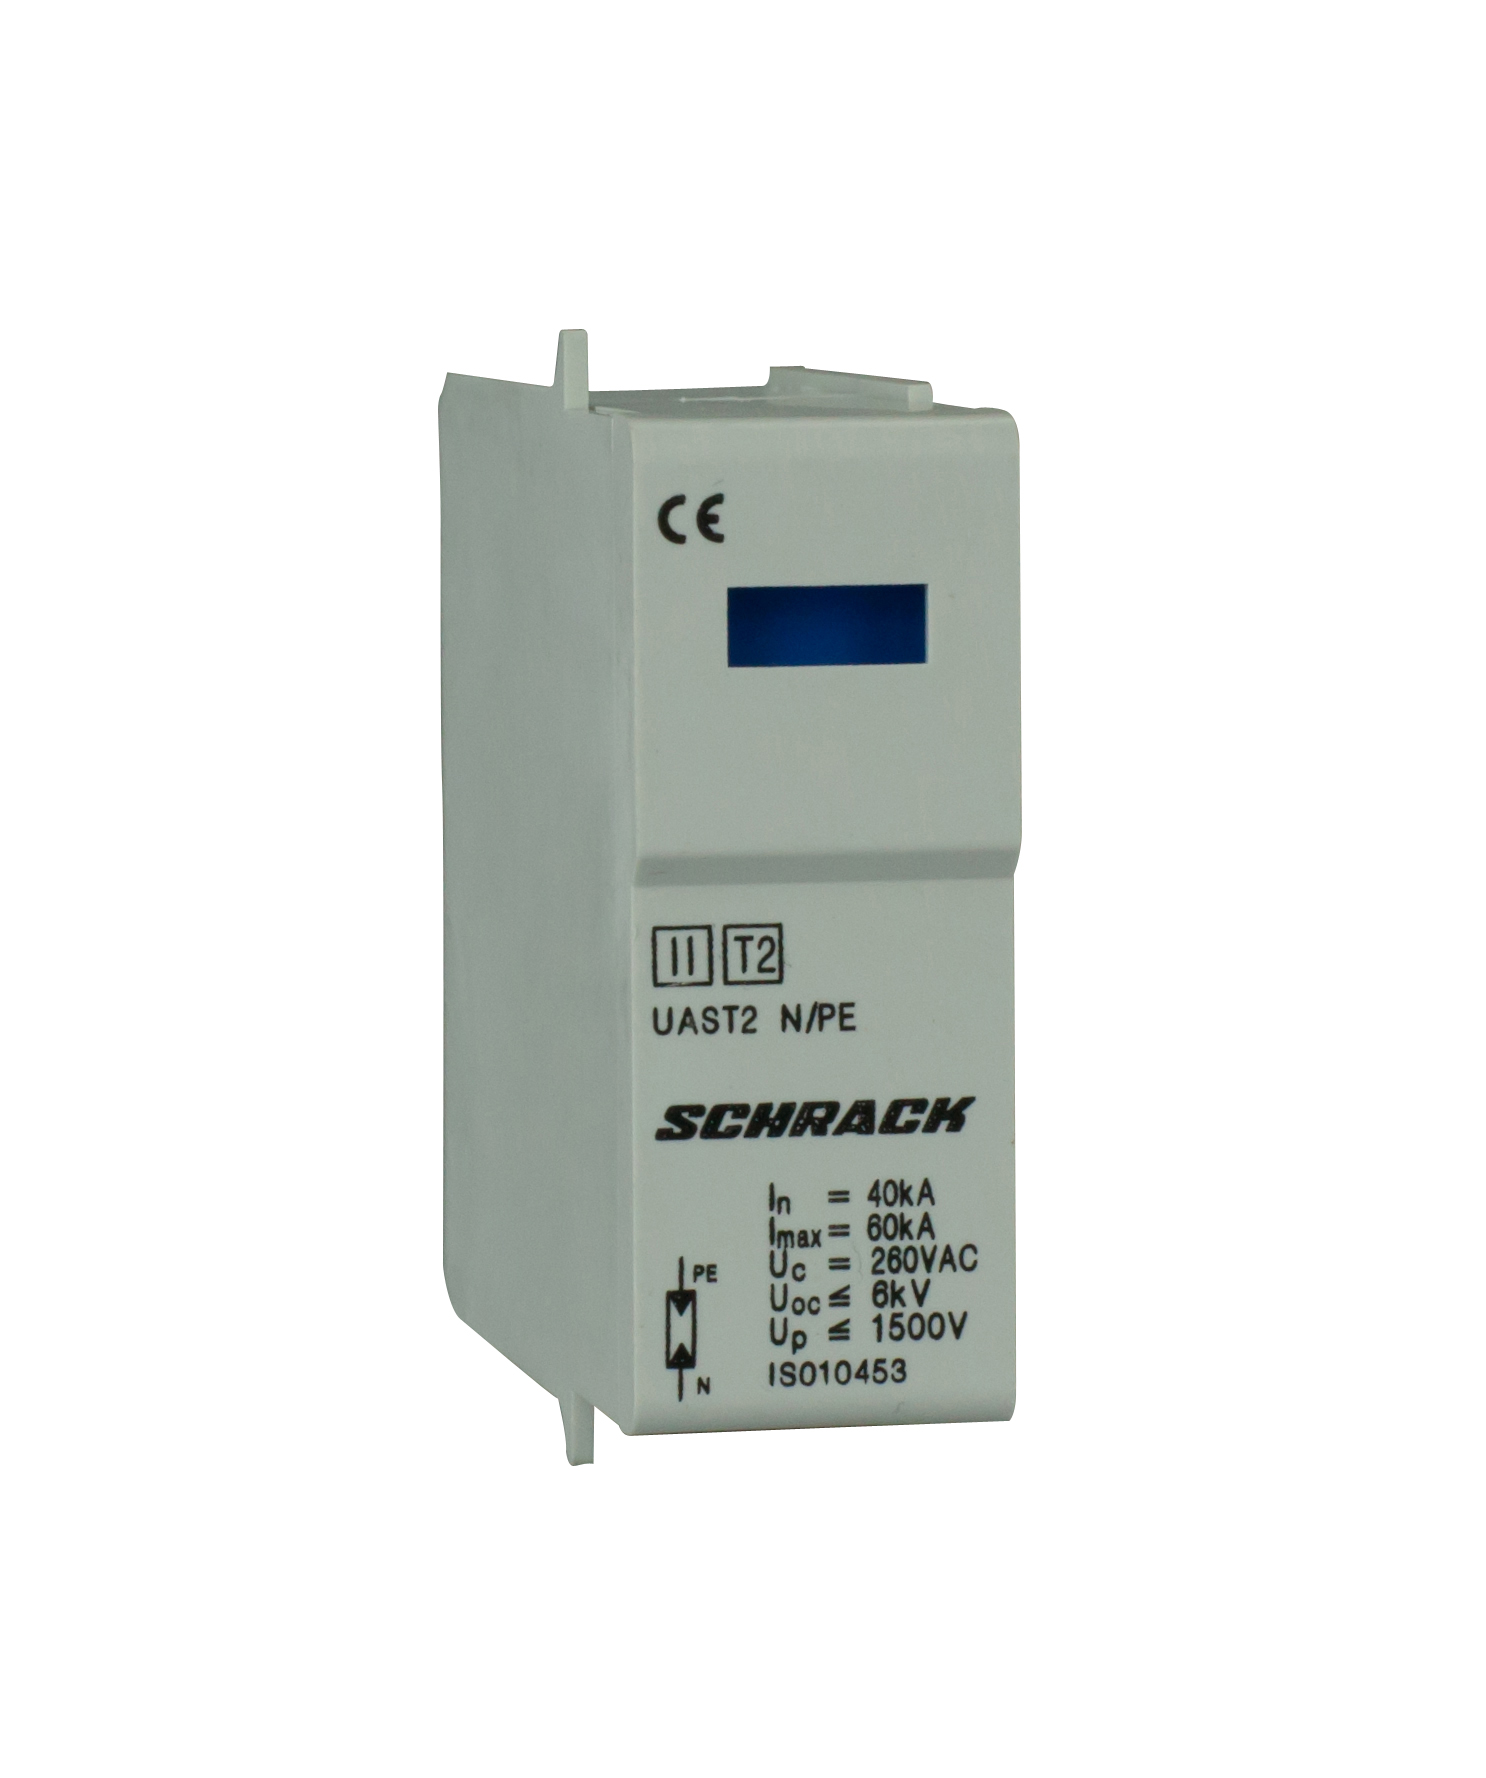 1 Stk T2/C - Ableitermoduleinsatz GG 60kA/260V - Serie UAS IS010453--